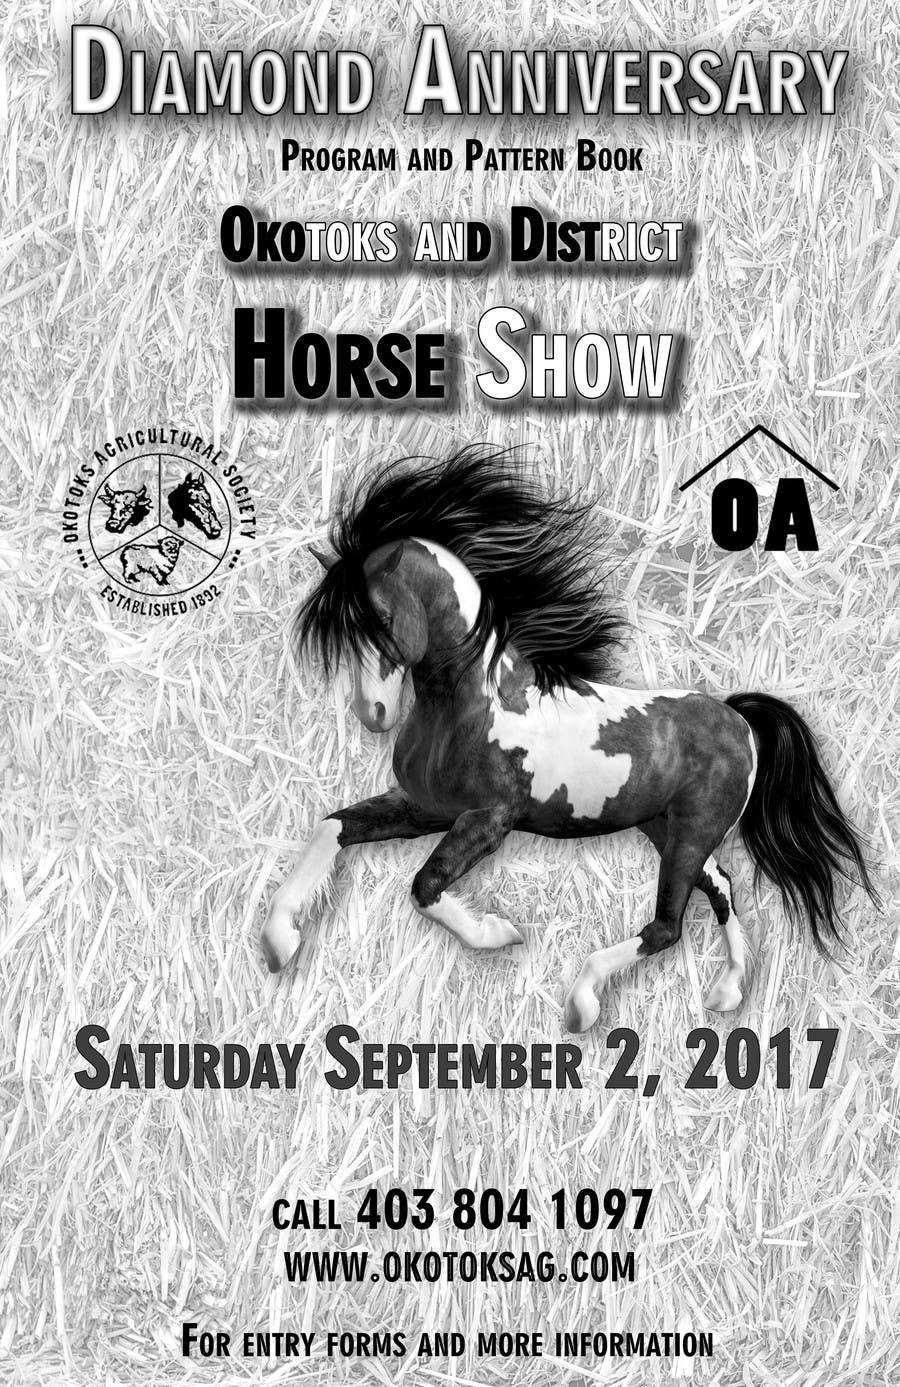 Proposition n°1 du concours Okotoks & District Horse Show Program and Pattern Book